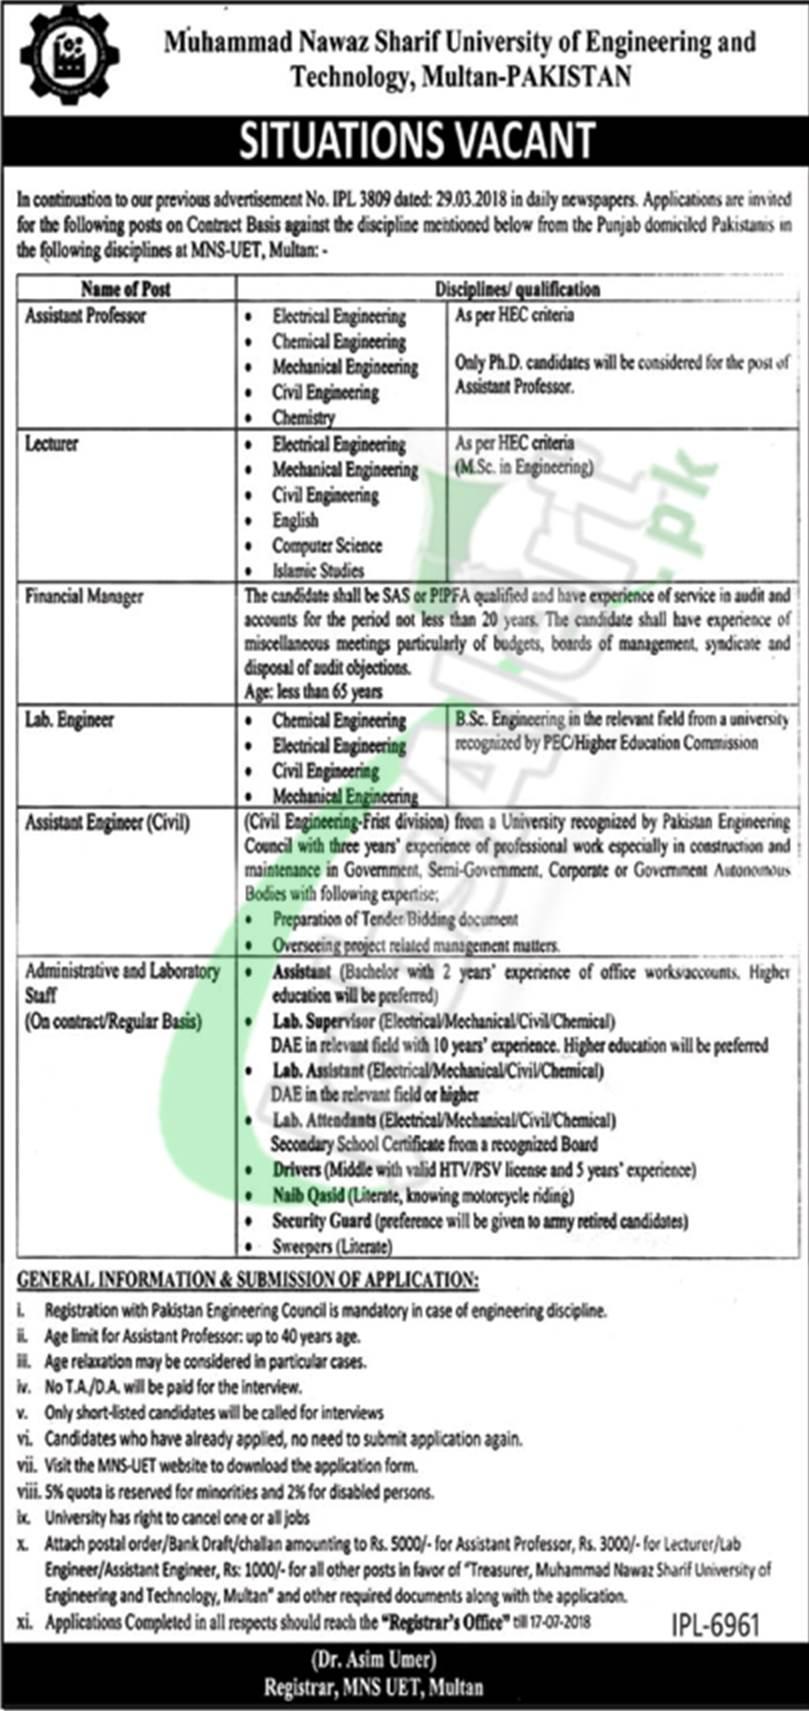 Muhammad Nawaz Sharif University of Engineering & Technology Multan Jobs 2018